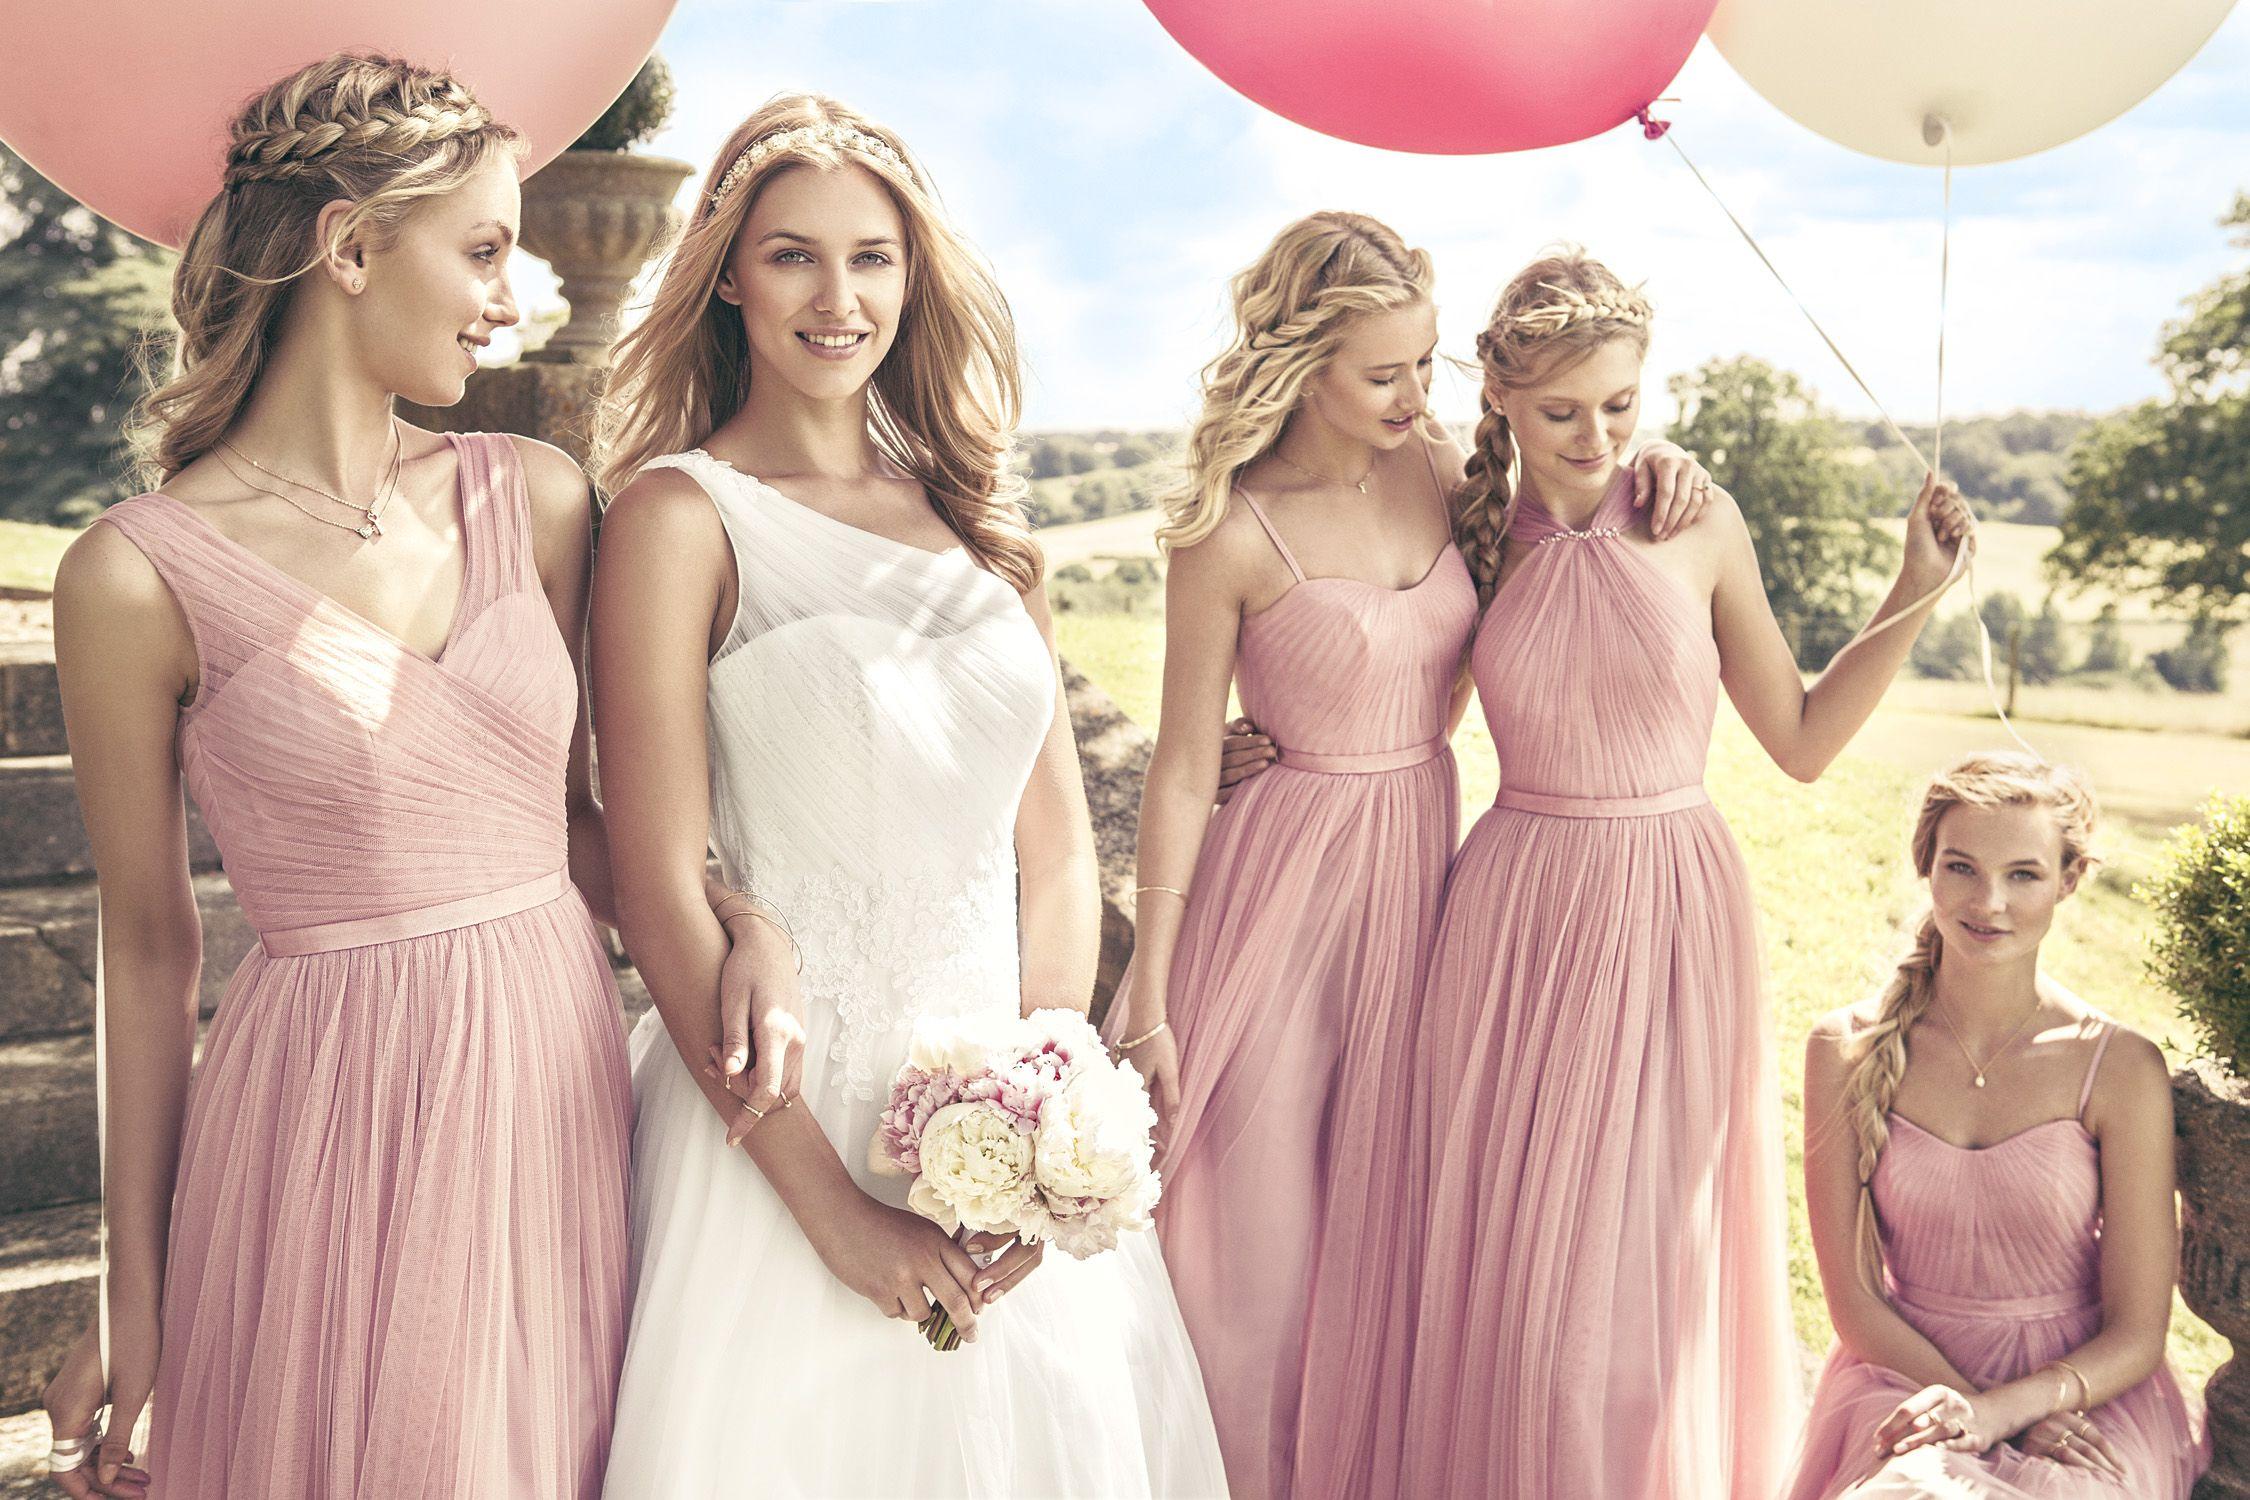 The kelsey rose bridesmaids 2015 collection wedding dresses | Damas ...